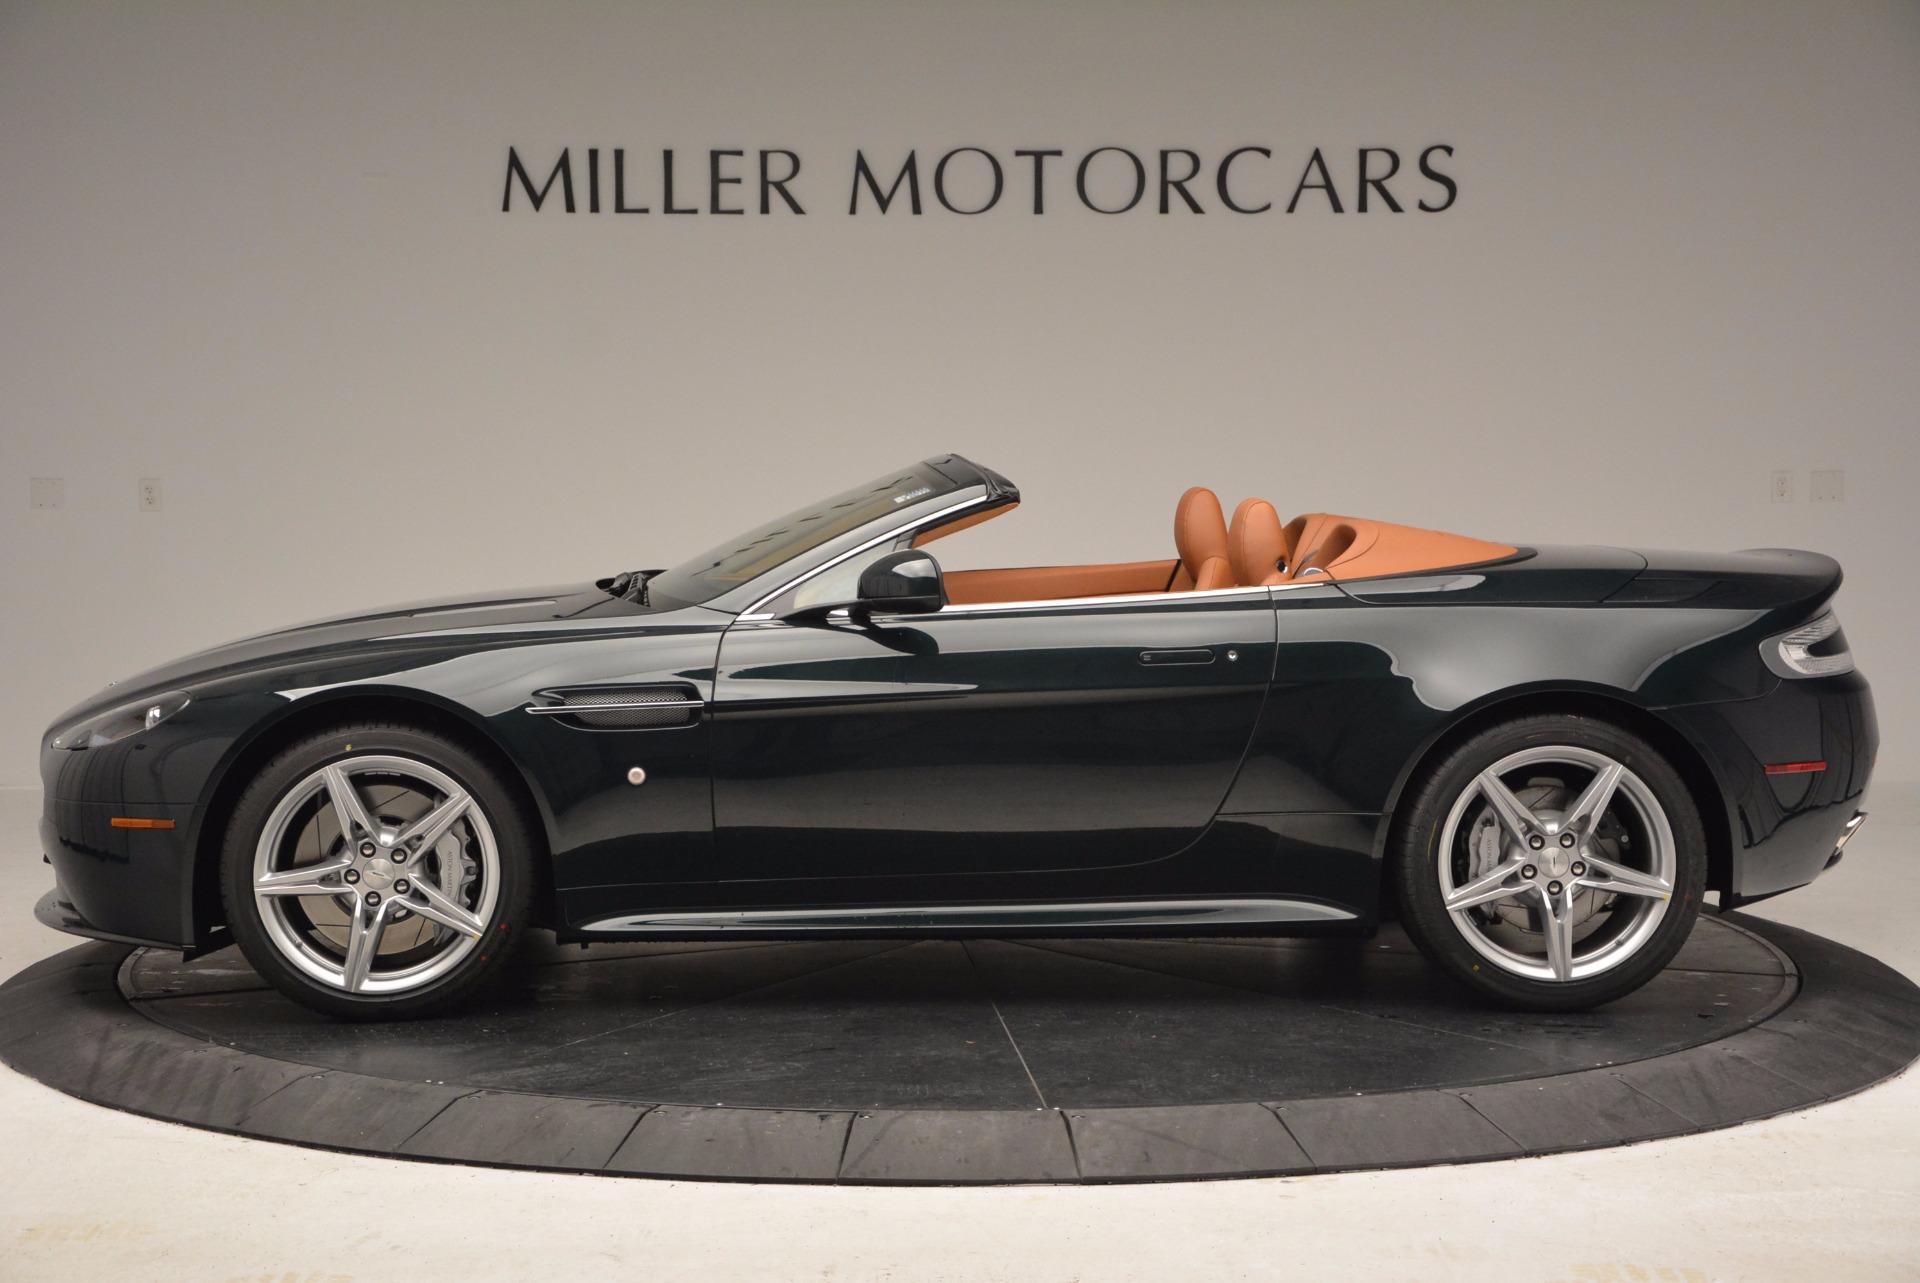 Used 2016 Aston Martin V8 Vantage S Roadster For Sale In Westport, CT 1550_p3